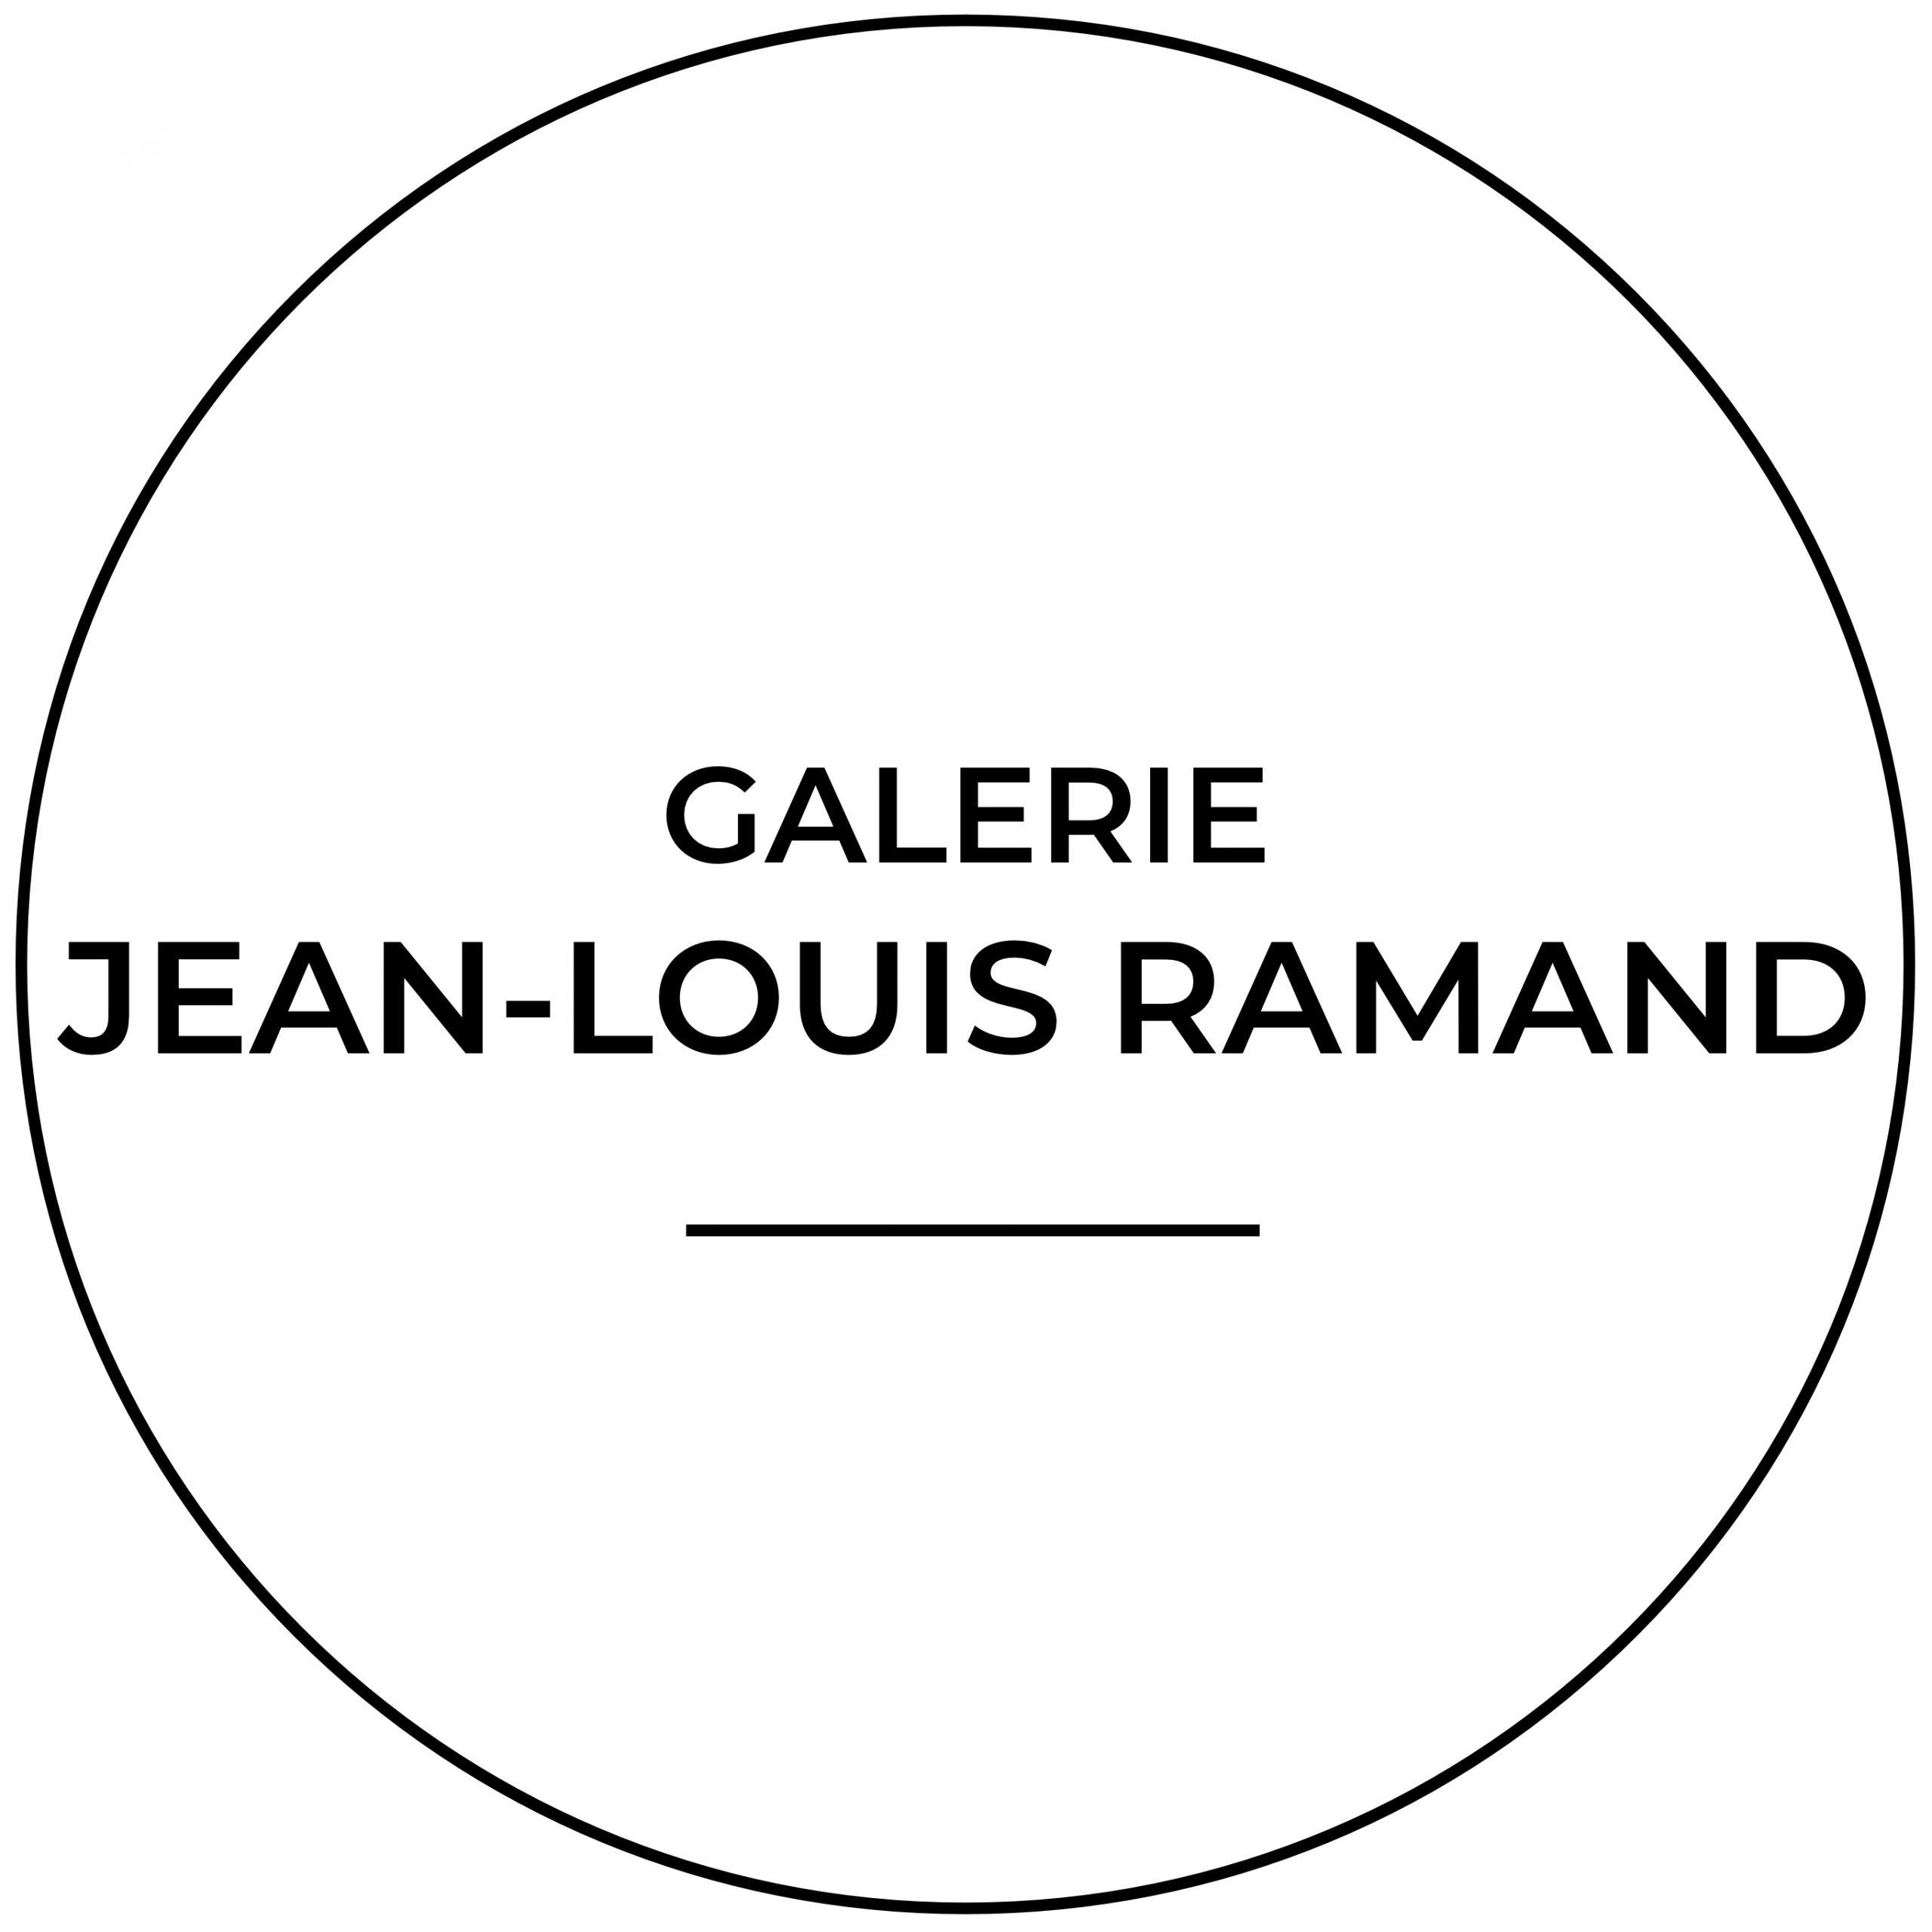 Galerie Jean-Louis Ramand